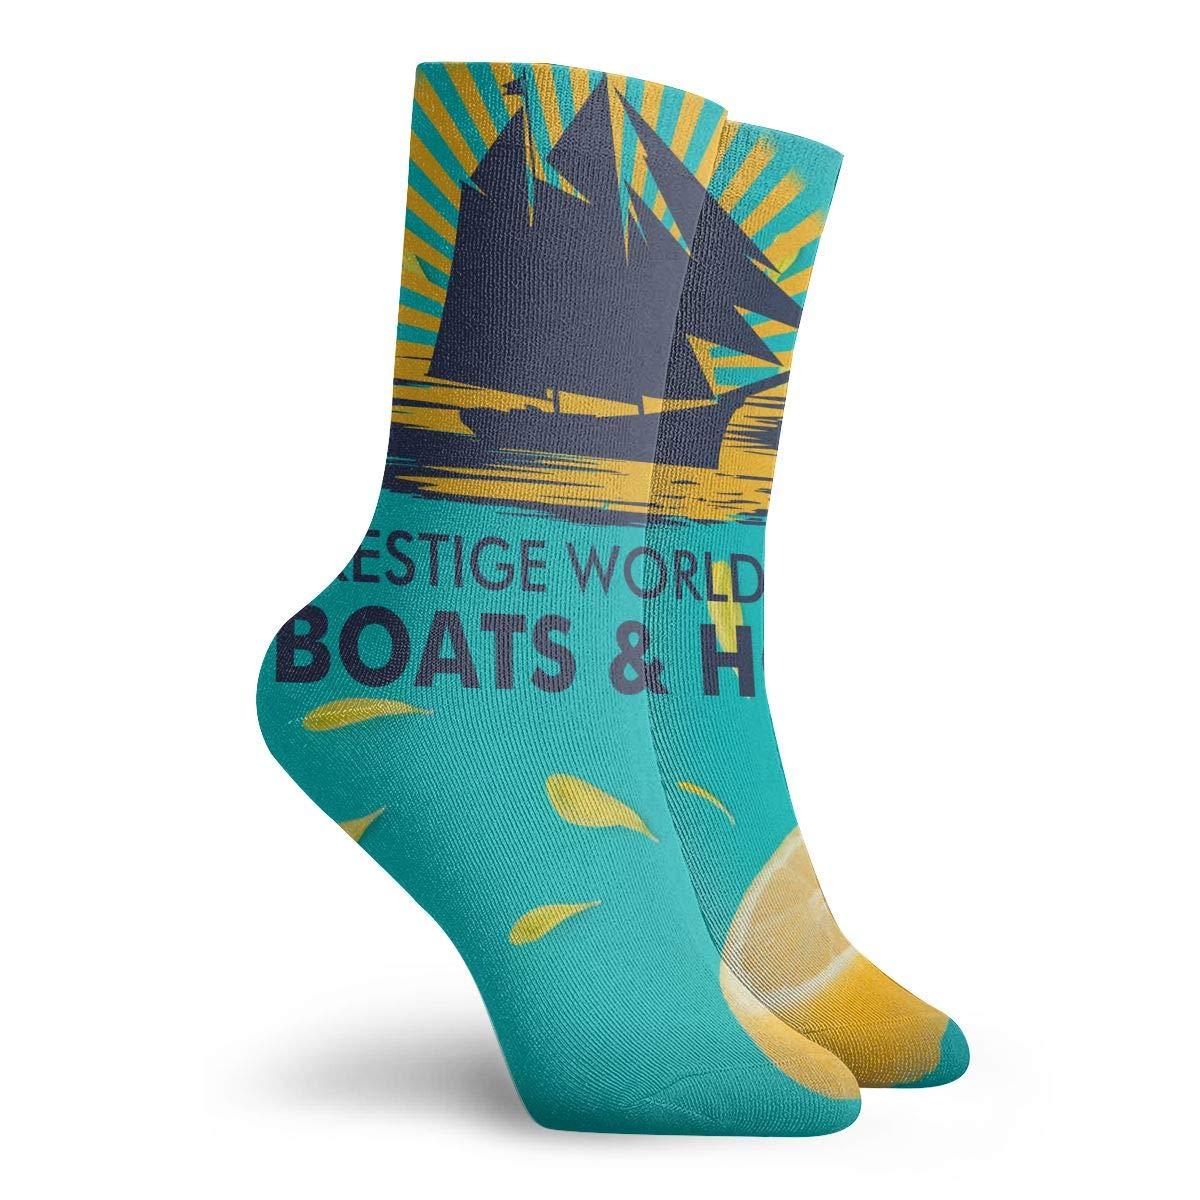 Boats Hoes Mens Fashion Dress Socks Short Socks Leisure Travel 11.8 Inch